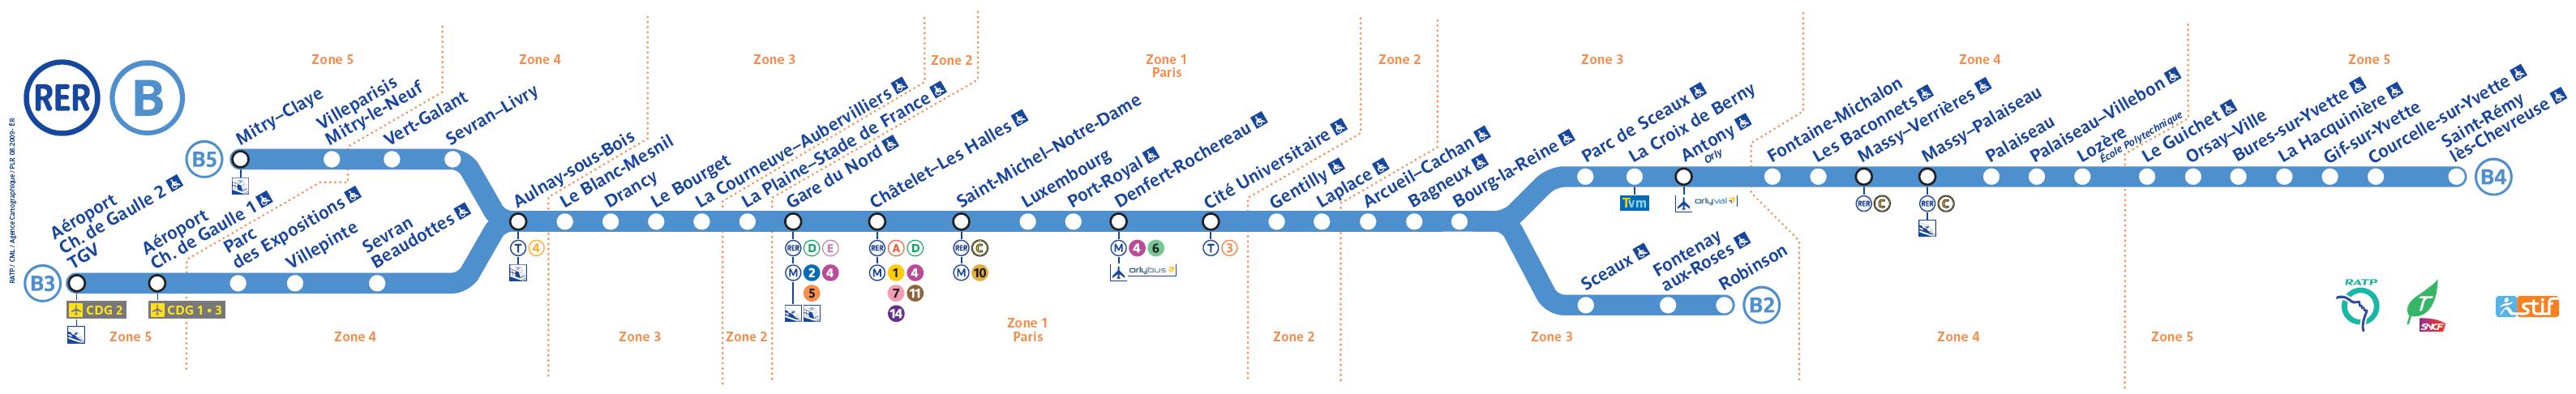 Réseau express régional το εισιτήριο κοστίζει 9 5